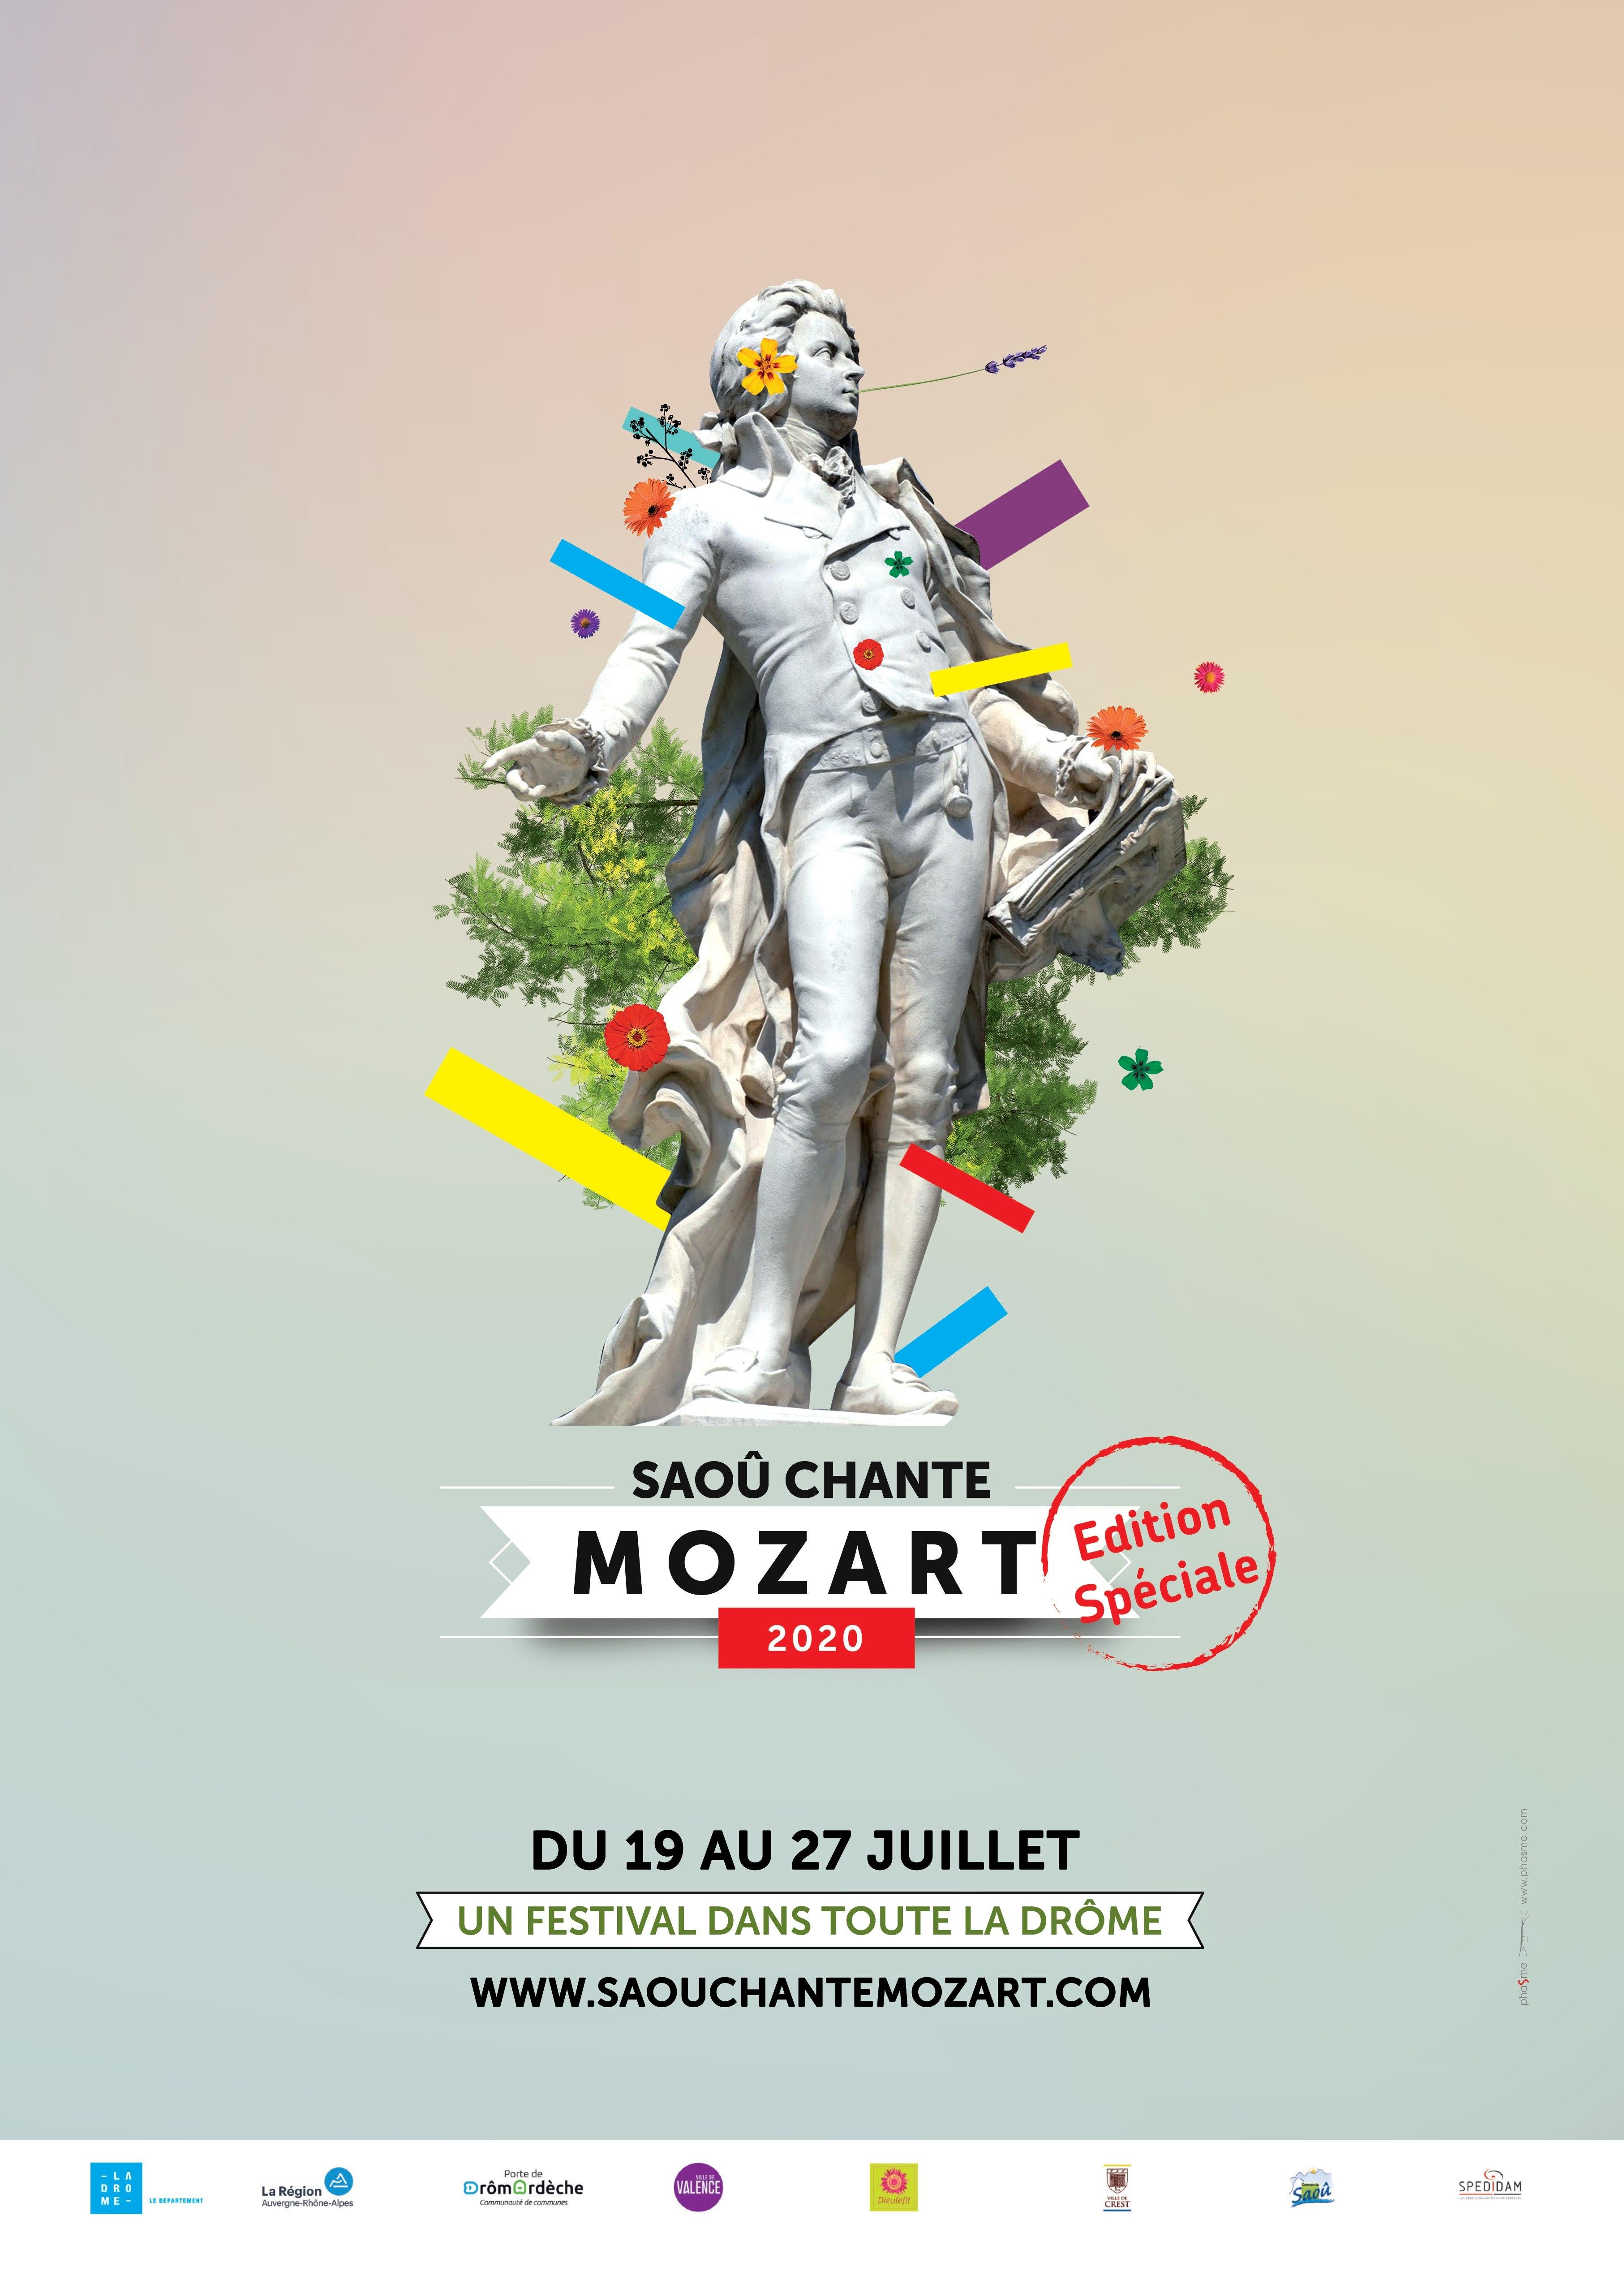 Saoû chante Mozart 2020 - Edition Spéciale